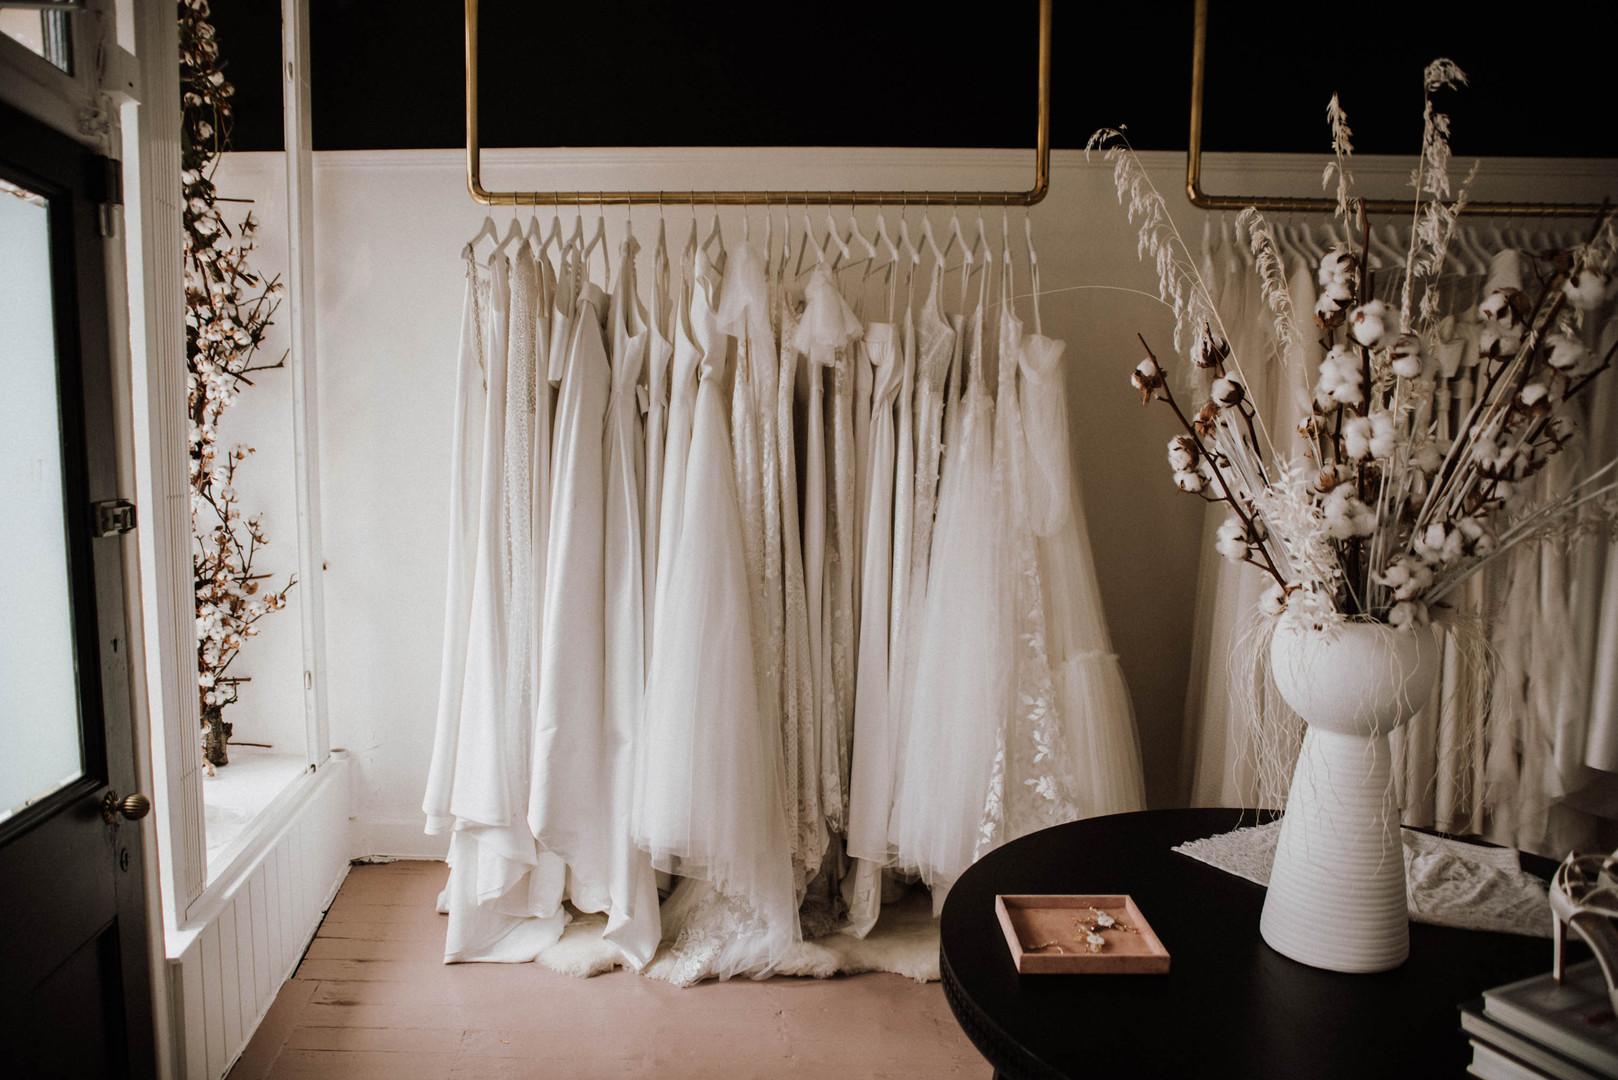 emmy-shoots-the-white-closet-1.jpg